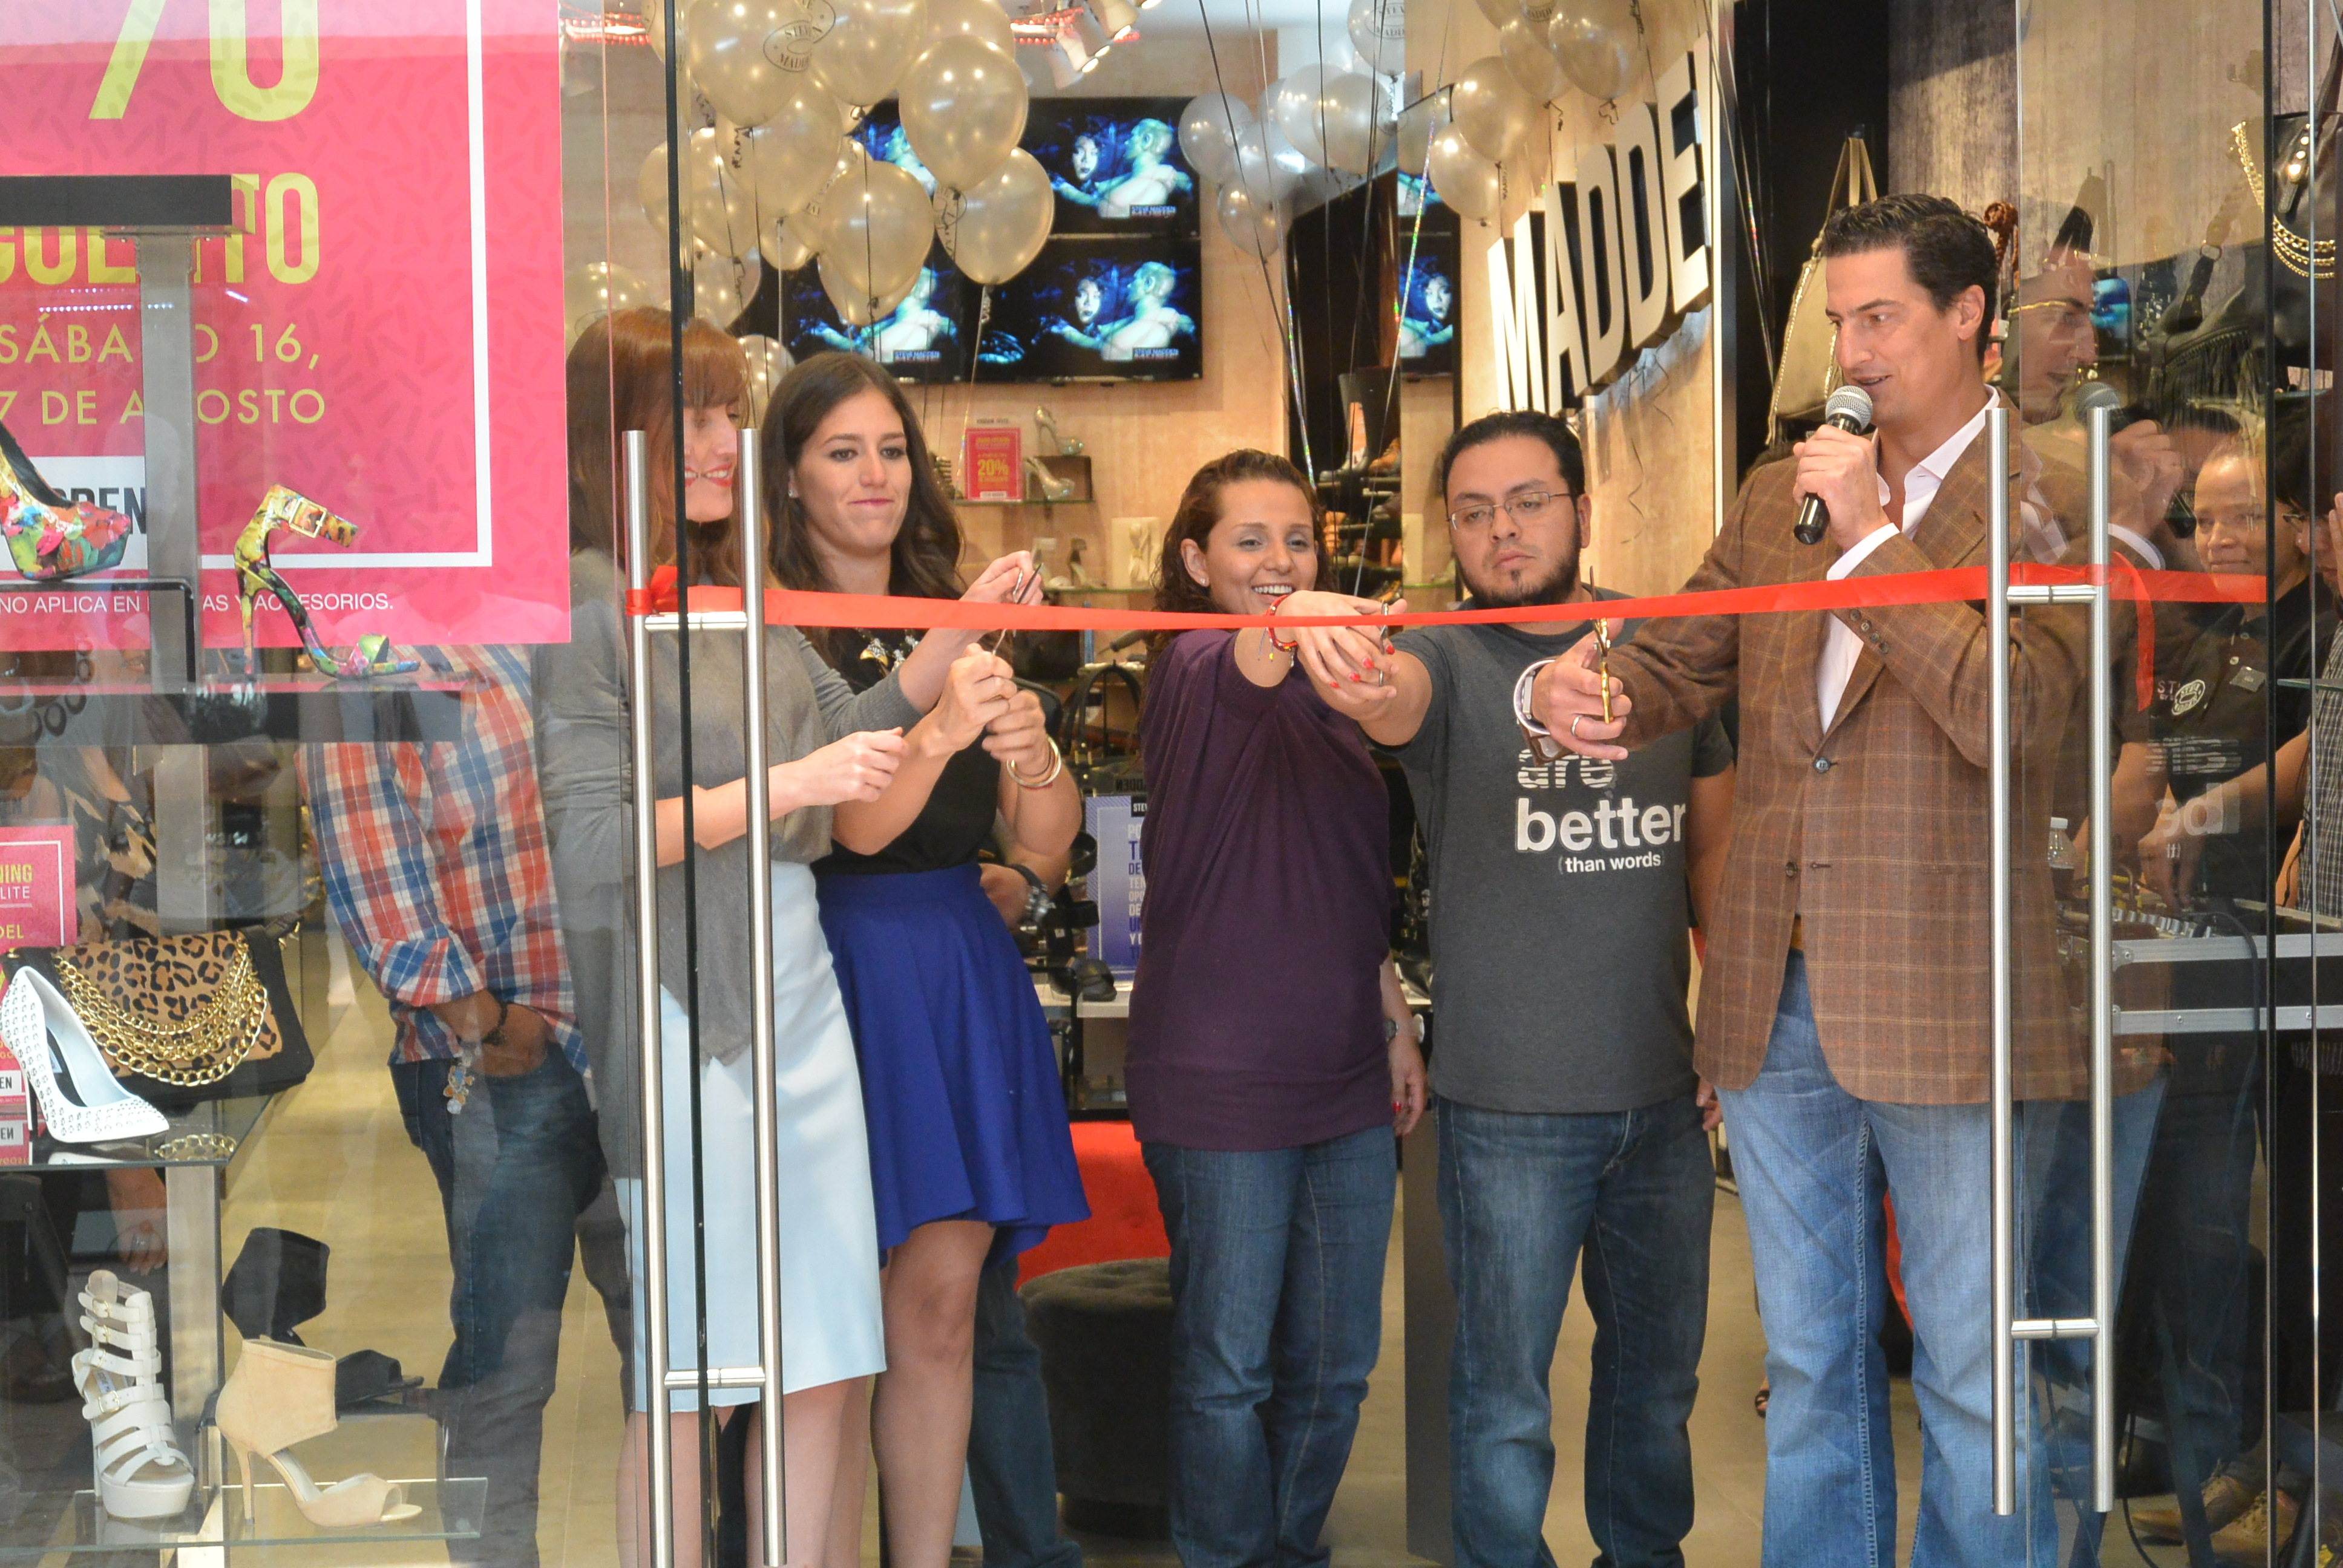 Influencia Visión bruja  Steve Madden inaugura tienda #19 en Satélite – enterateonline